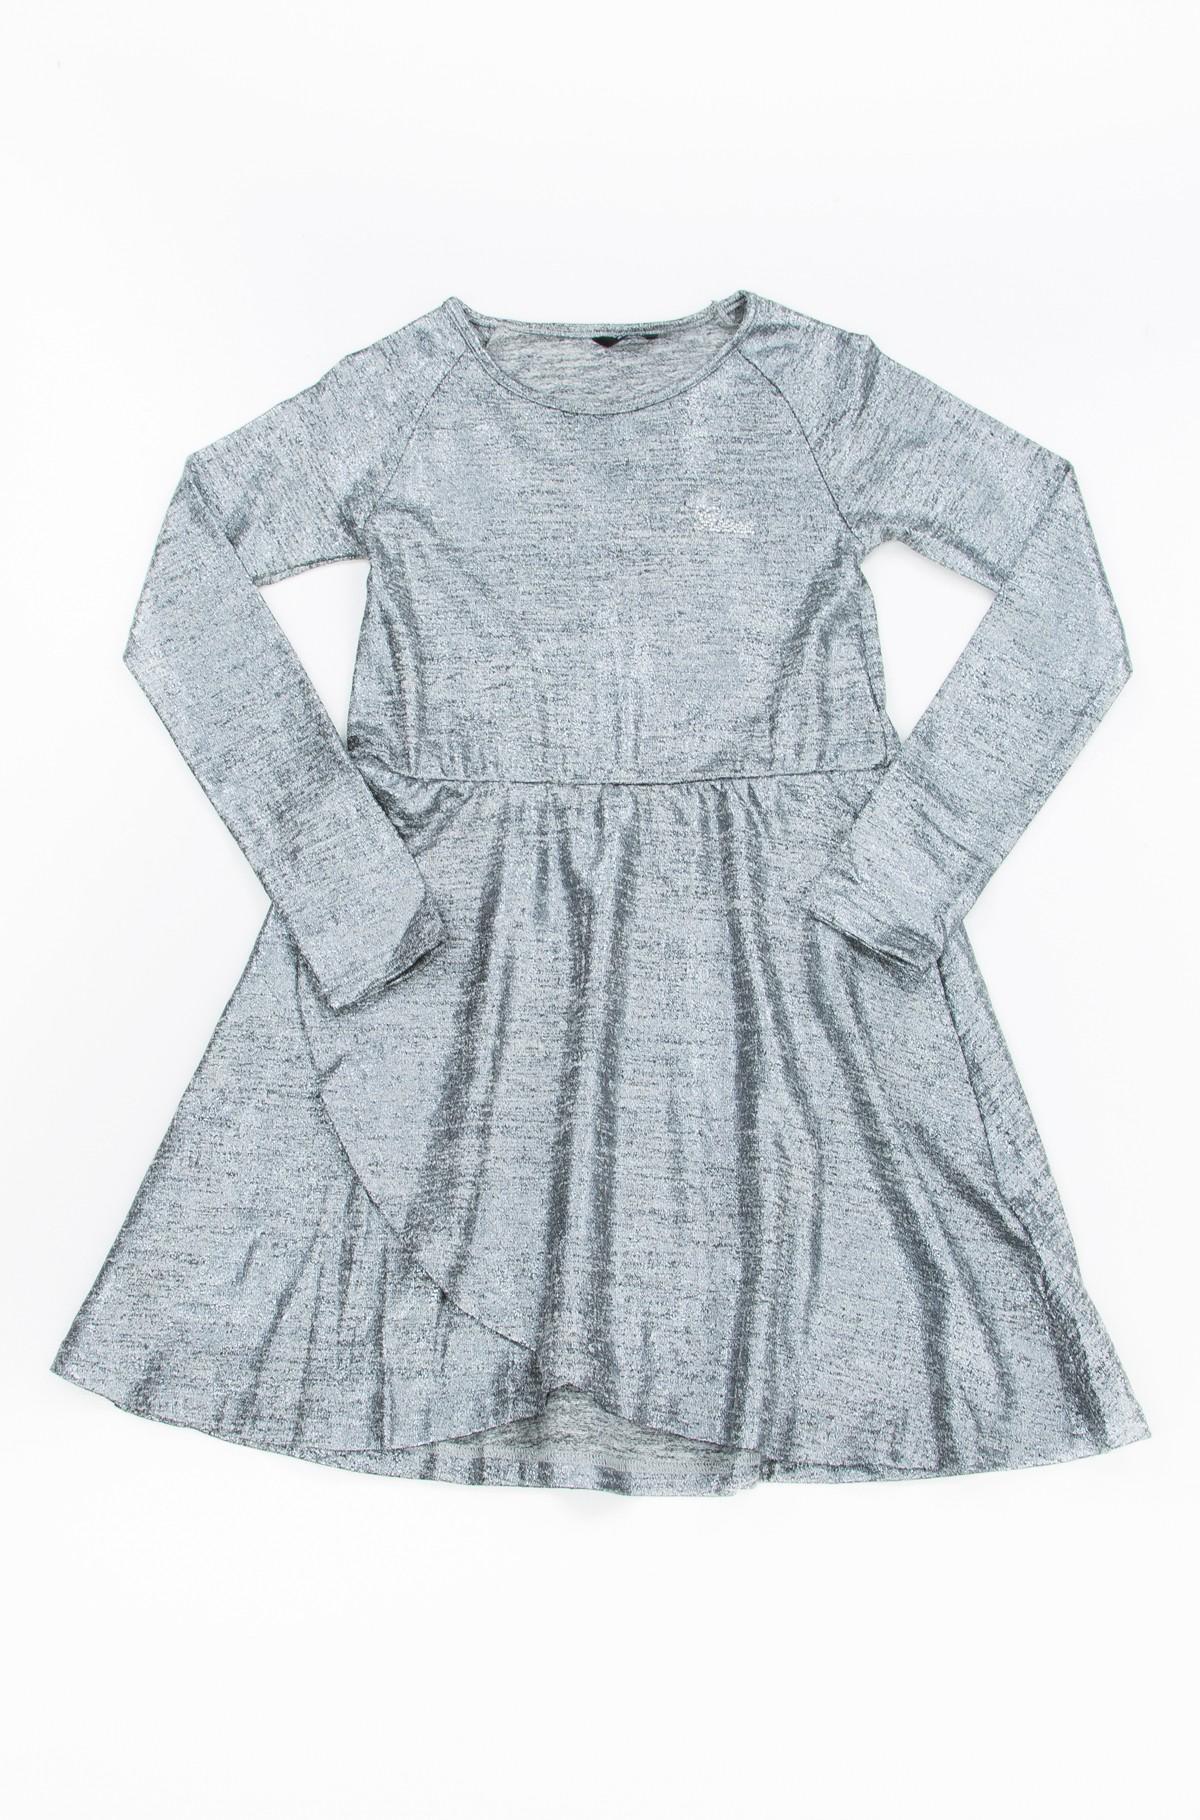 Vaikiška suknelė J74K14 K6EN0-full-1